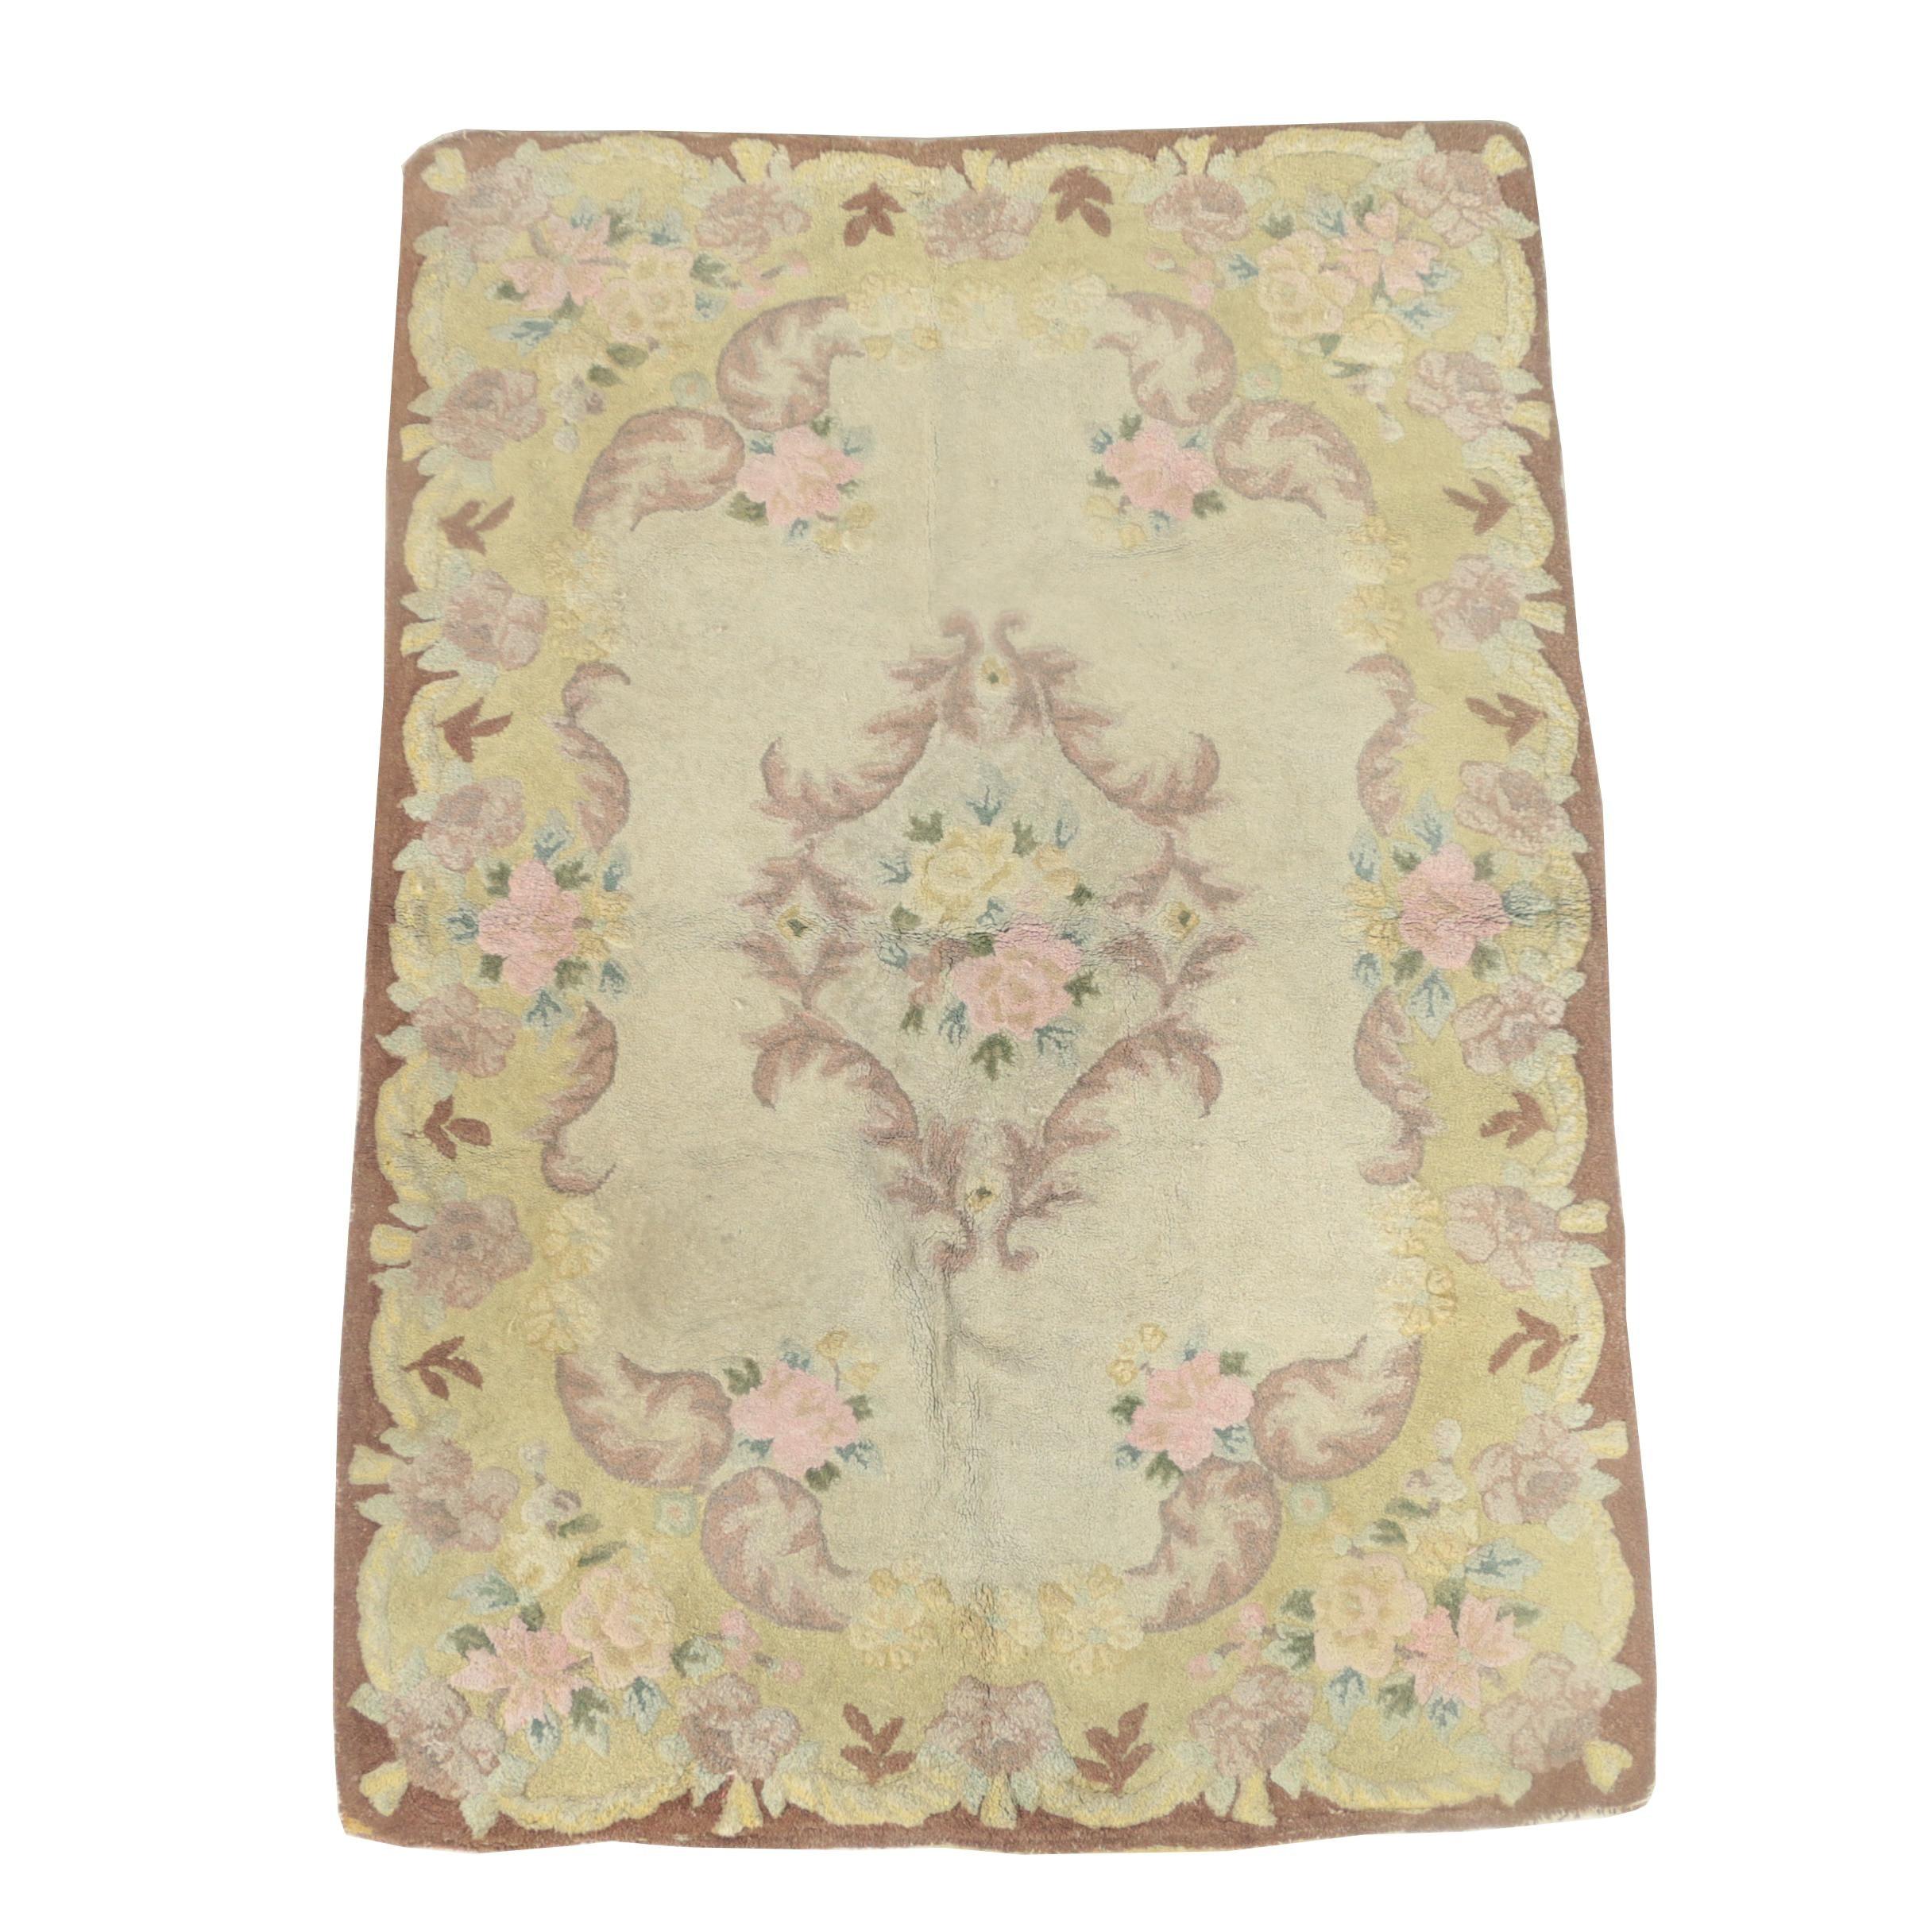 Vintage Hooked Floral and Foliate Wool Area Rug